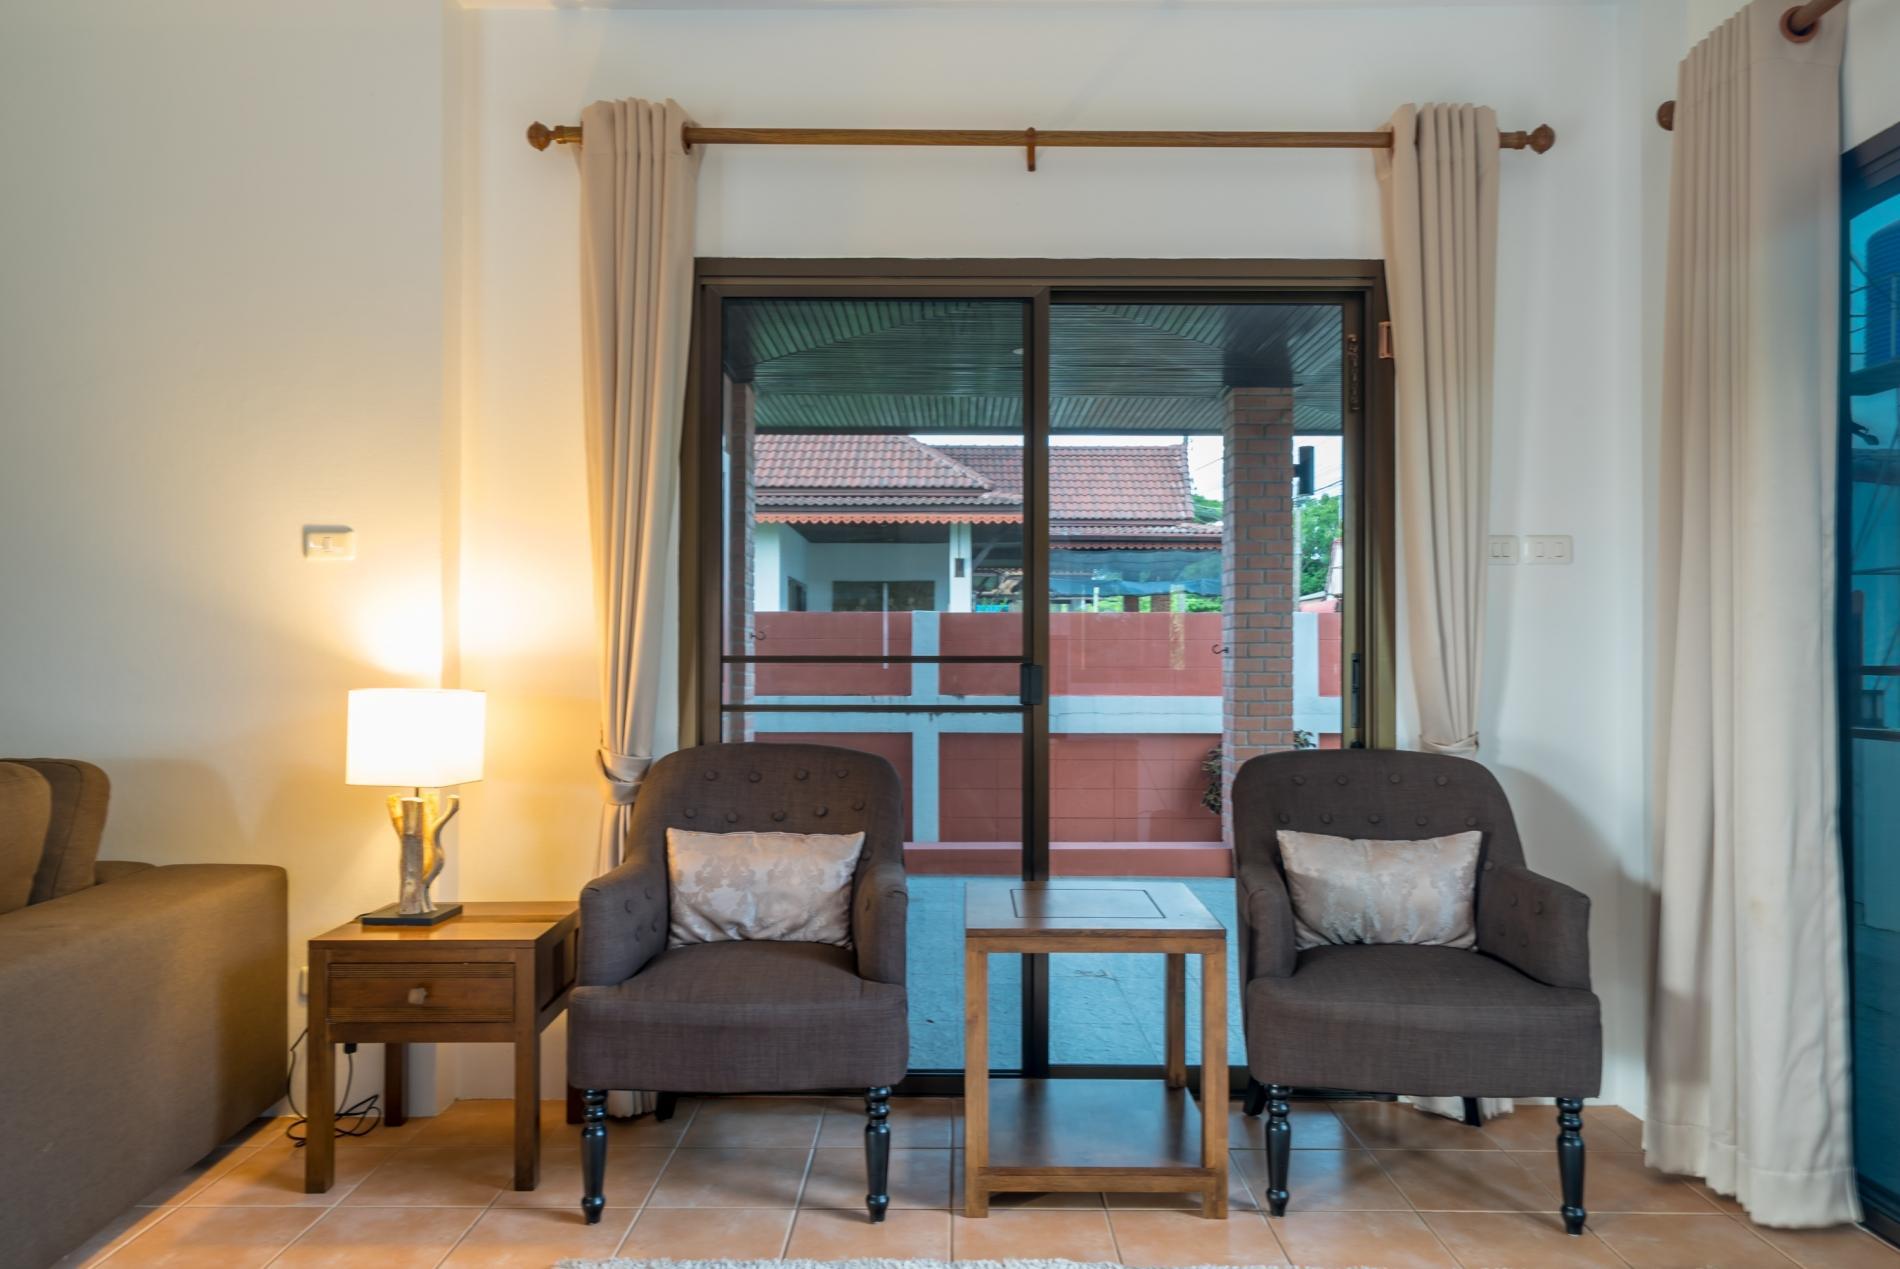 Pasak soi 3 - Convenient pool villa in quiet location, near Laguna, Boat avenue photo 5694286